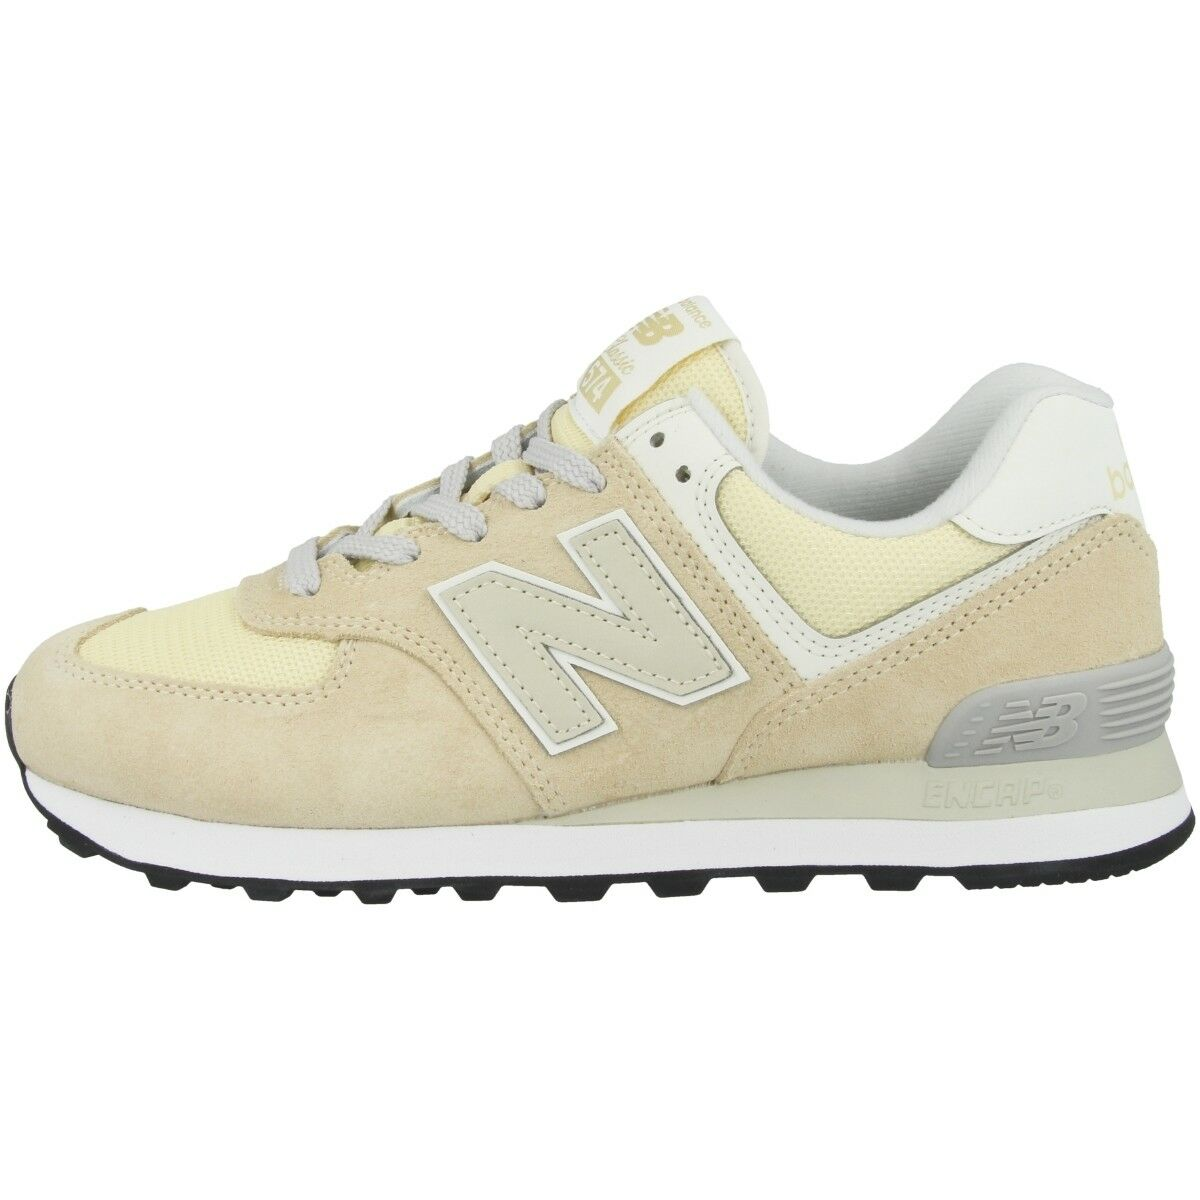 New Balance Damen WL 574 CRA Schuhe Damen Balance Sport Sneaker Turnschuhe vanilla WL574CRA 5c1b5c